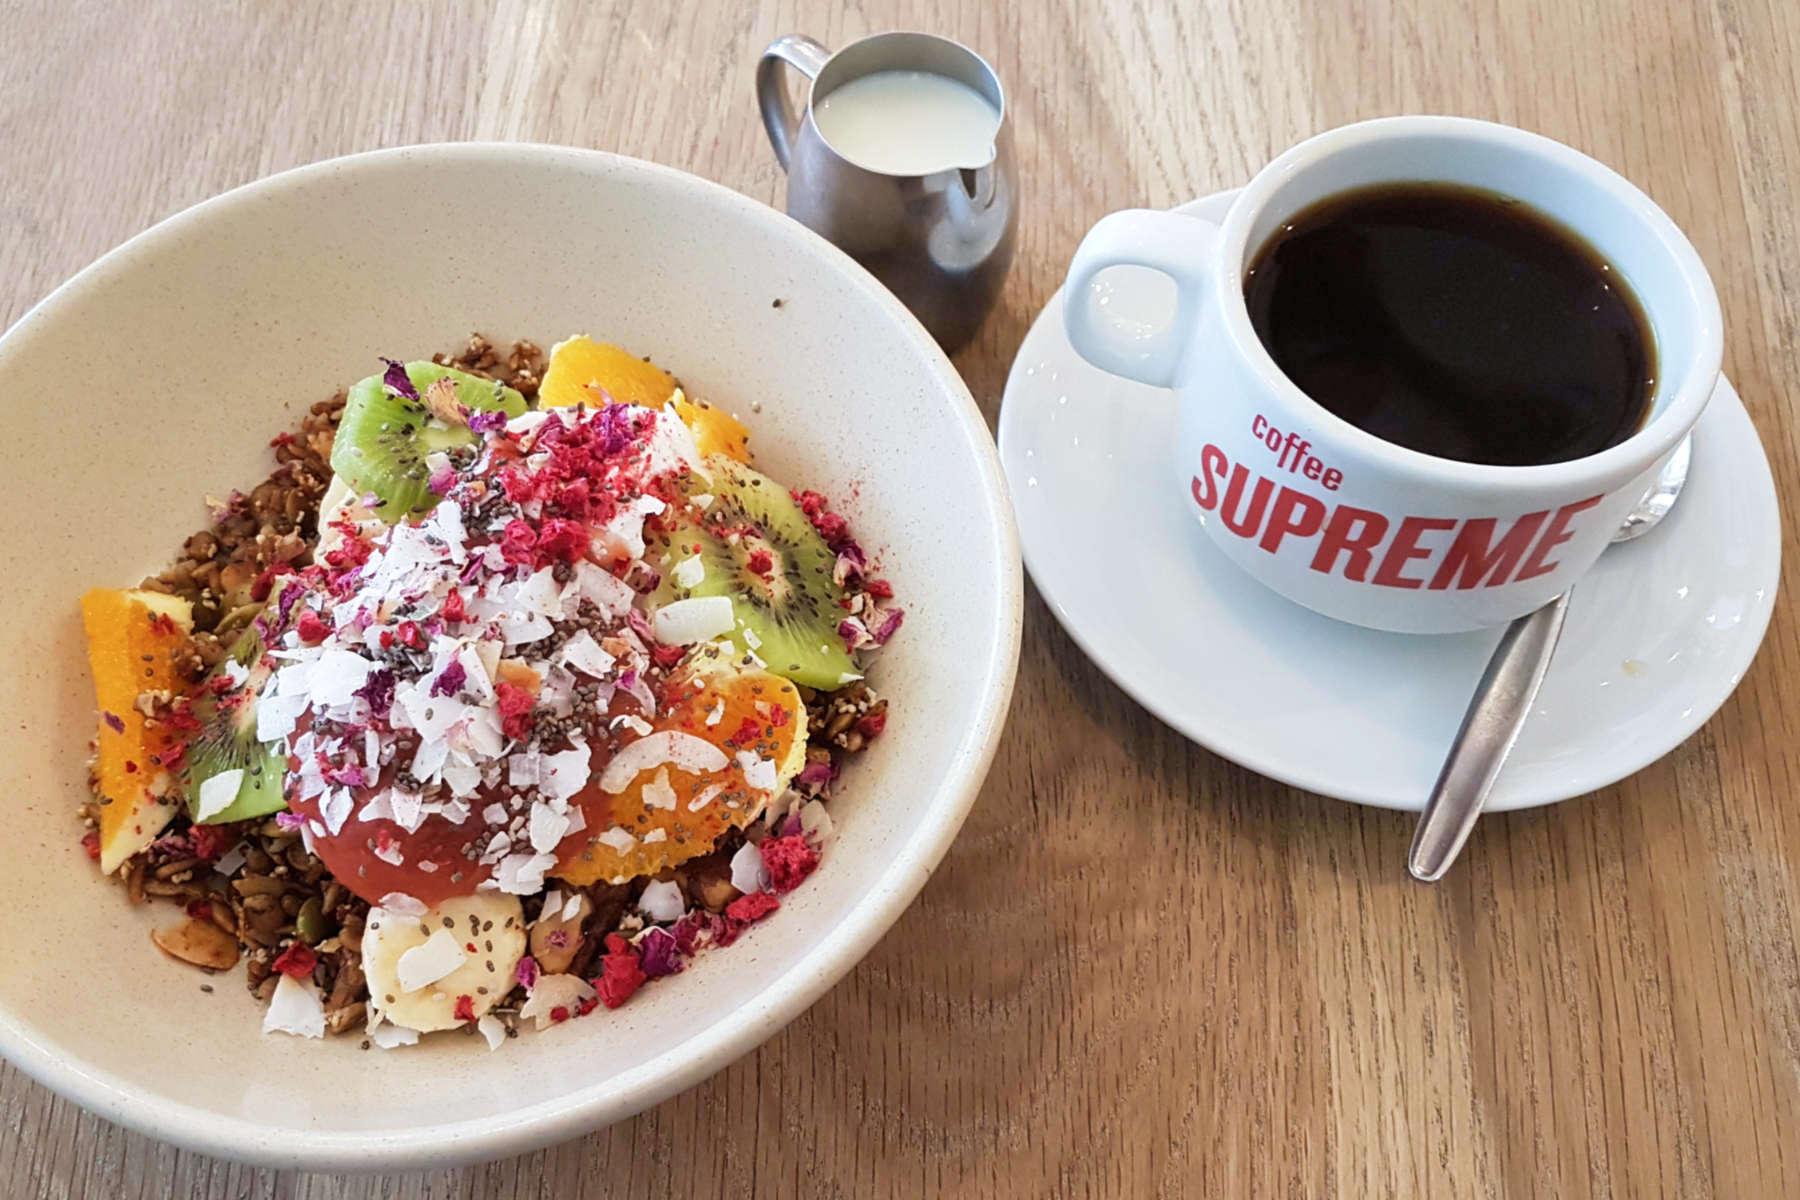 Neo - granola and coffee